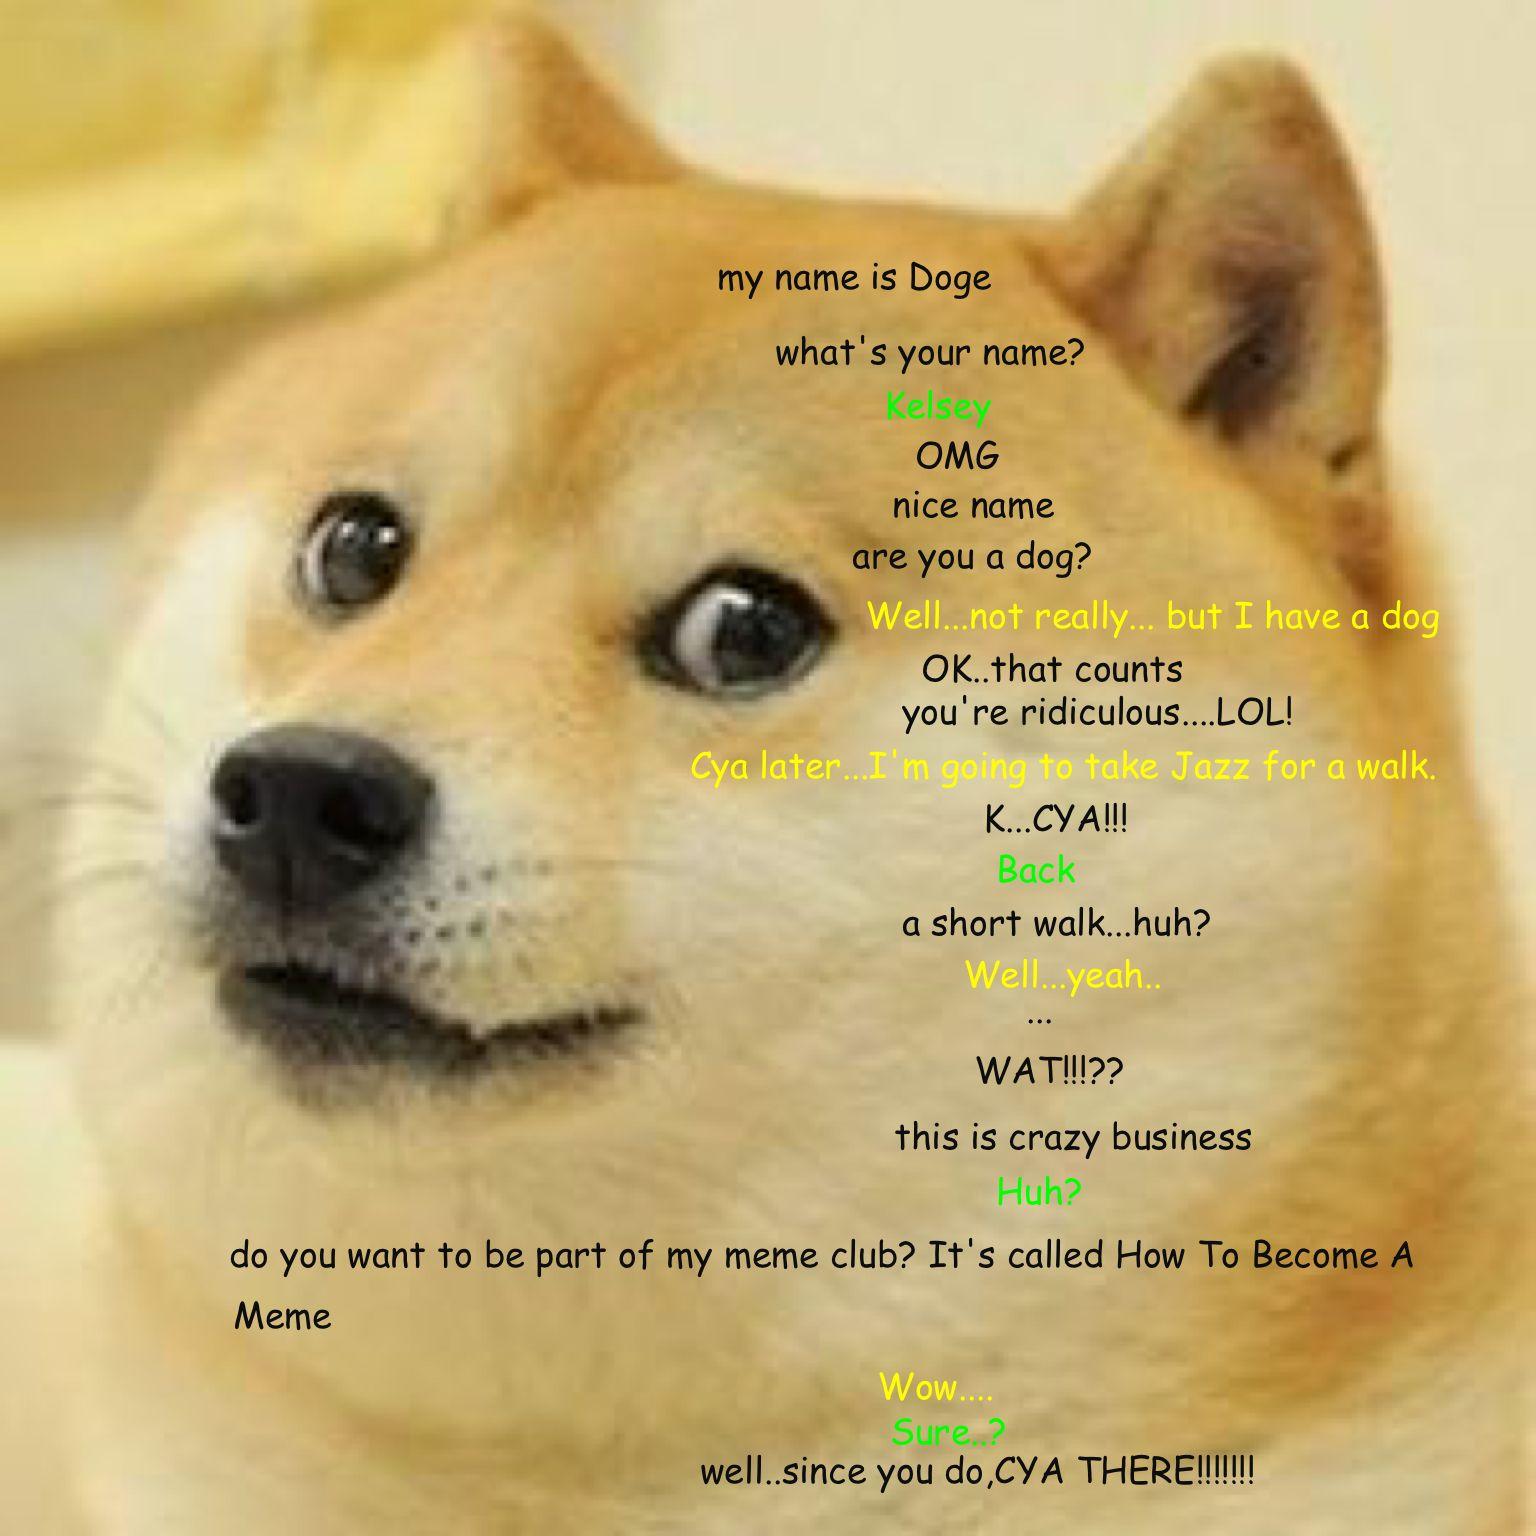 Kelsey joins the meme club Cute animal memes, Doge, Memes